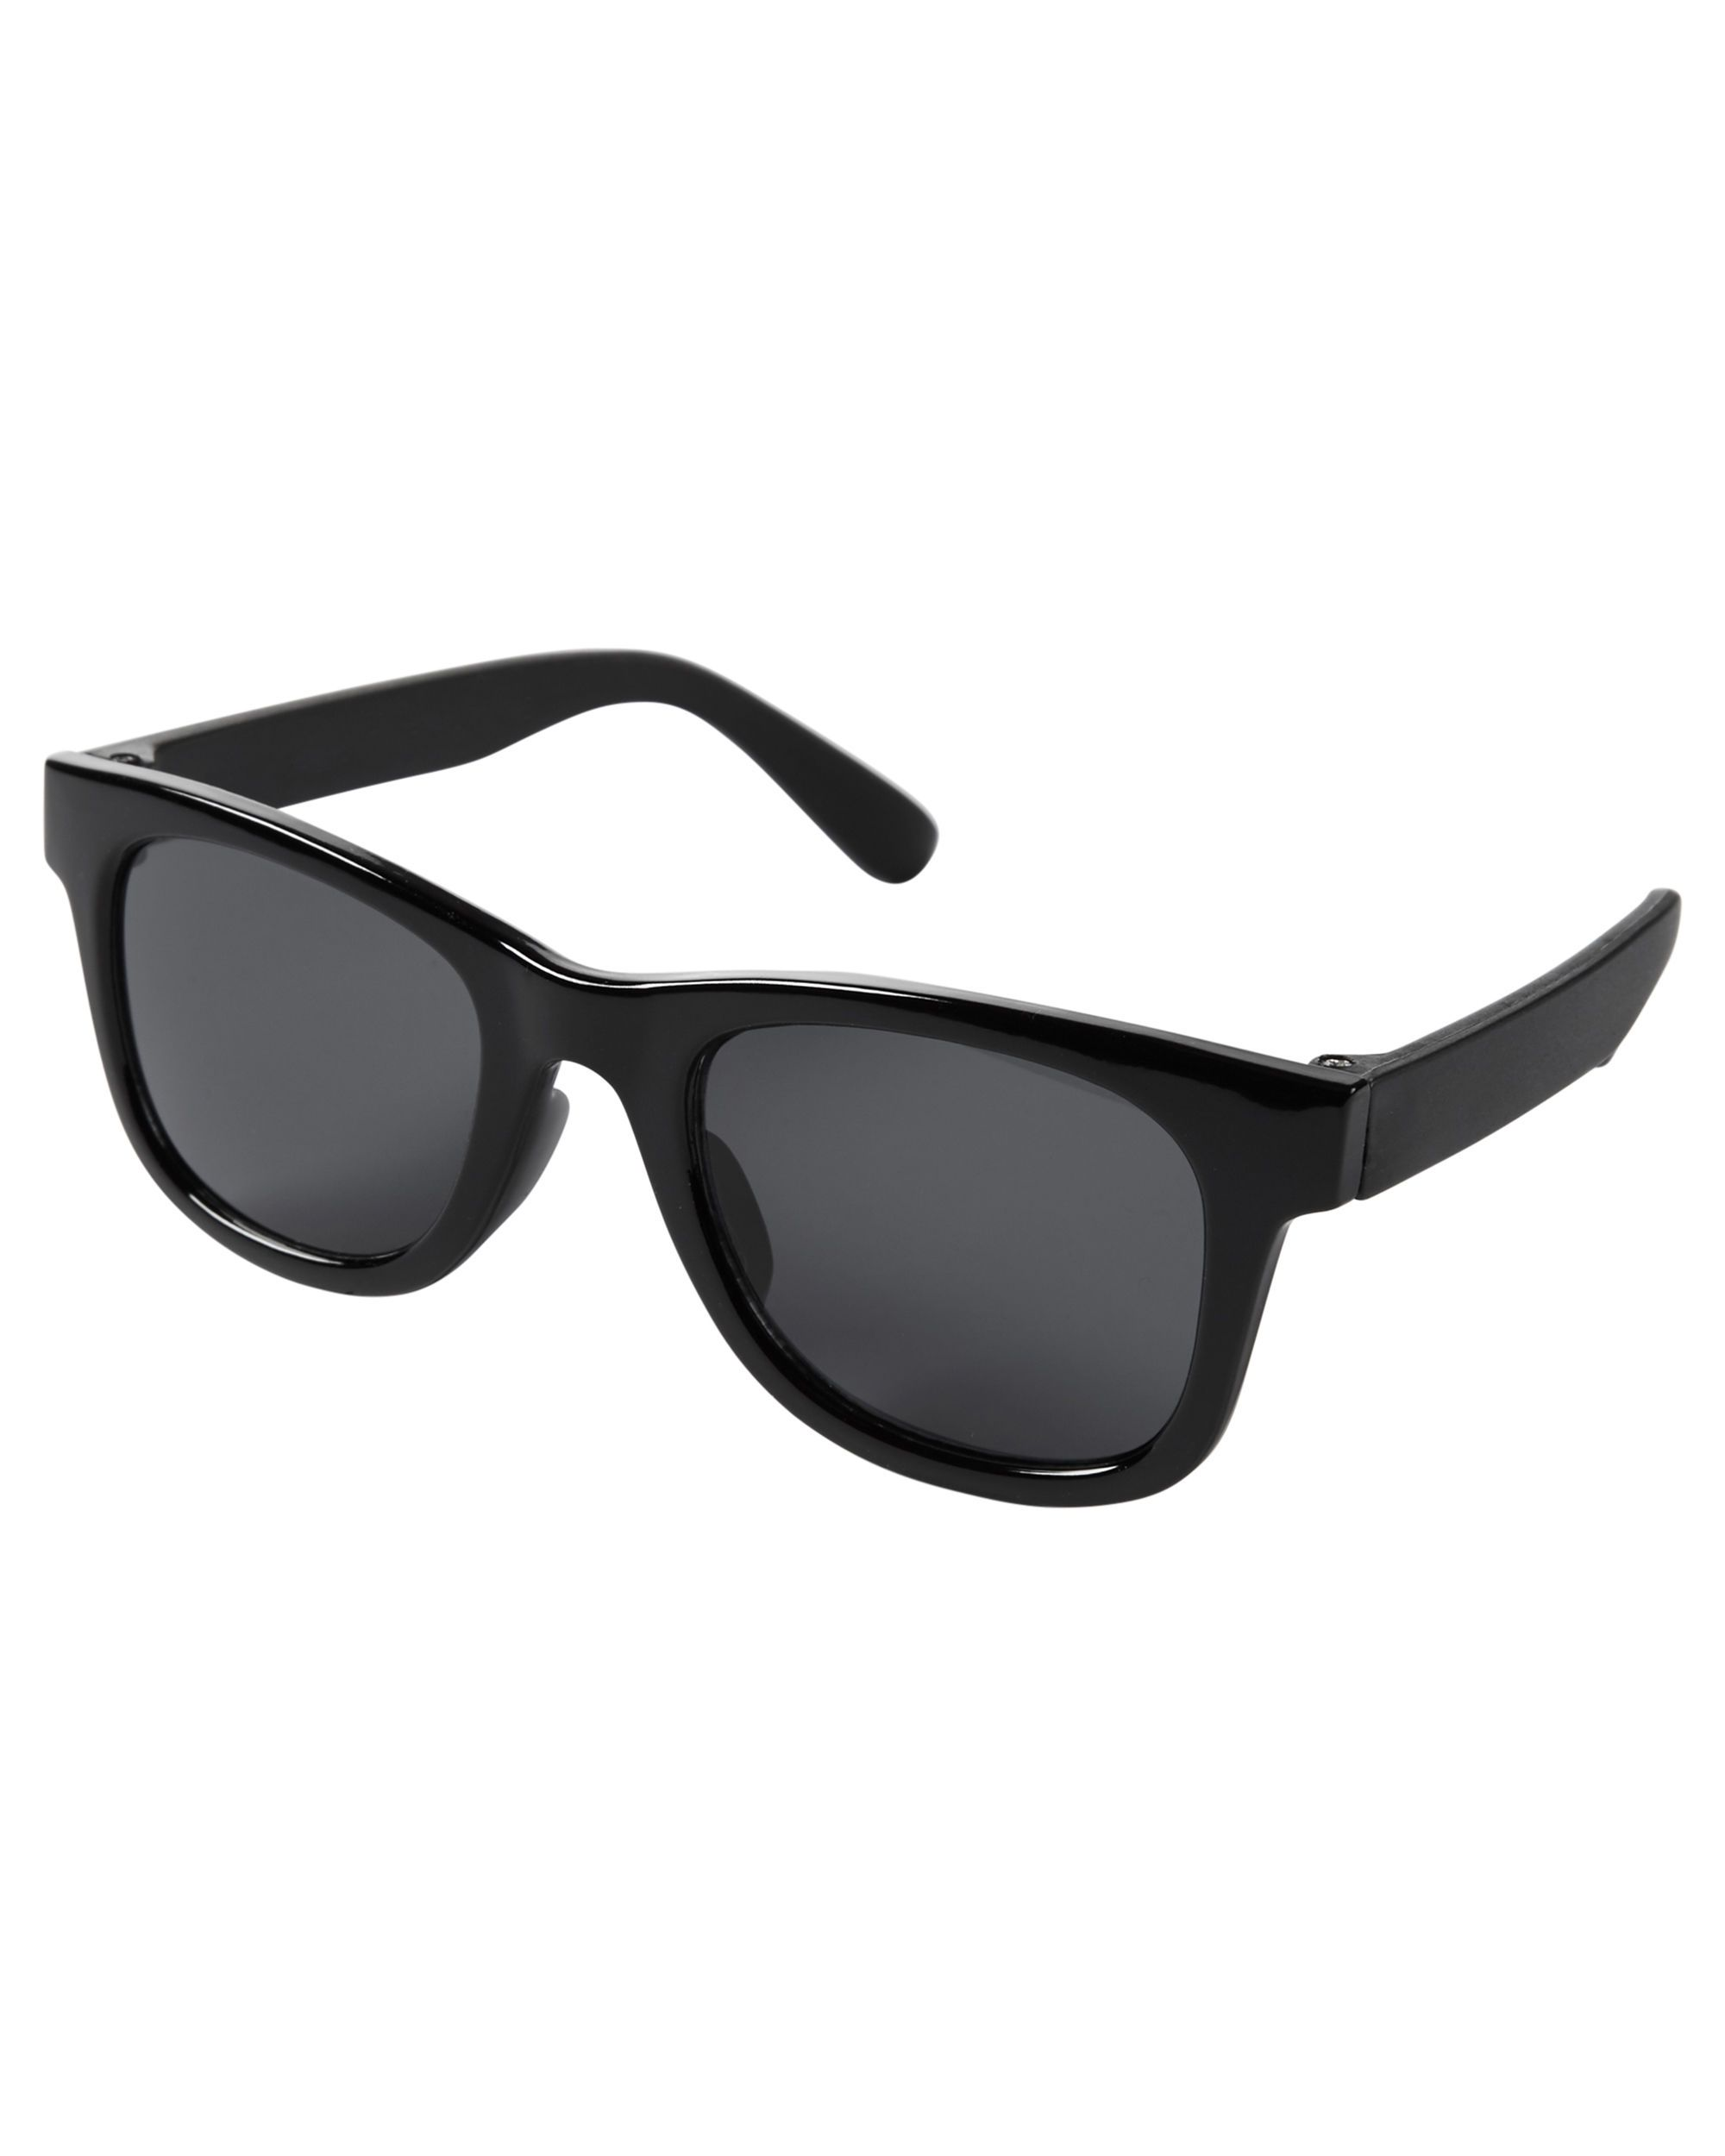 Bebe Beaba lunette Wayfarer Bebe Wayfarer